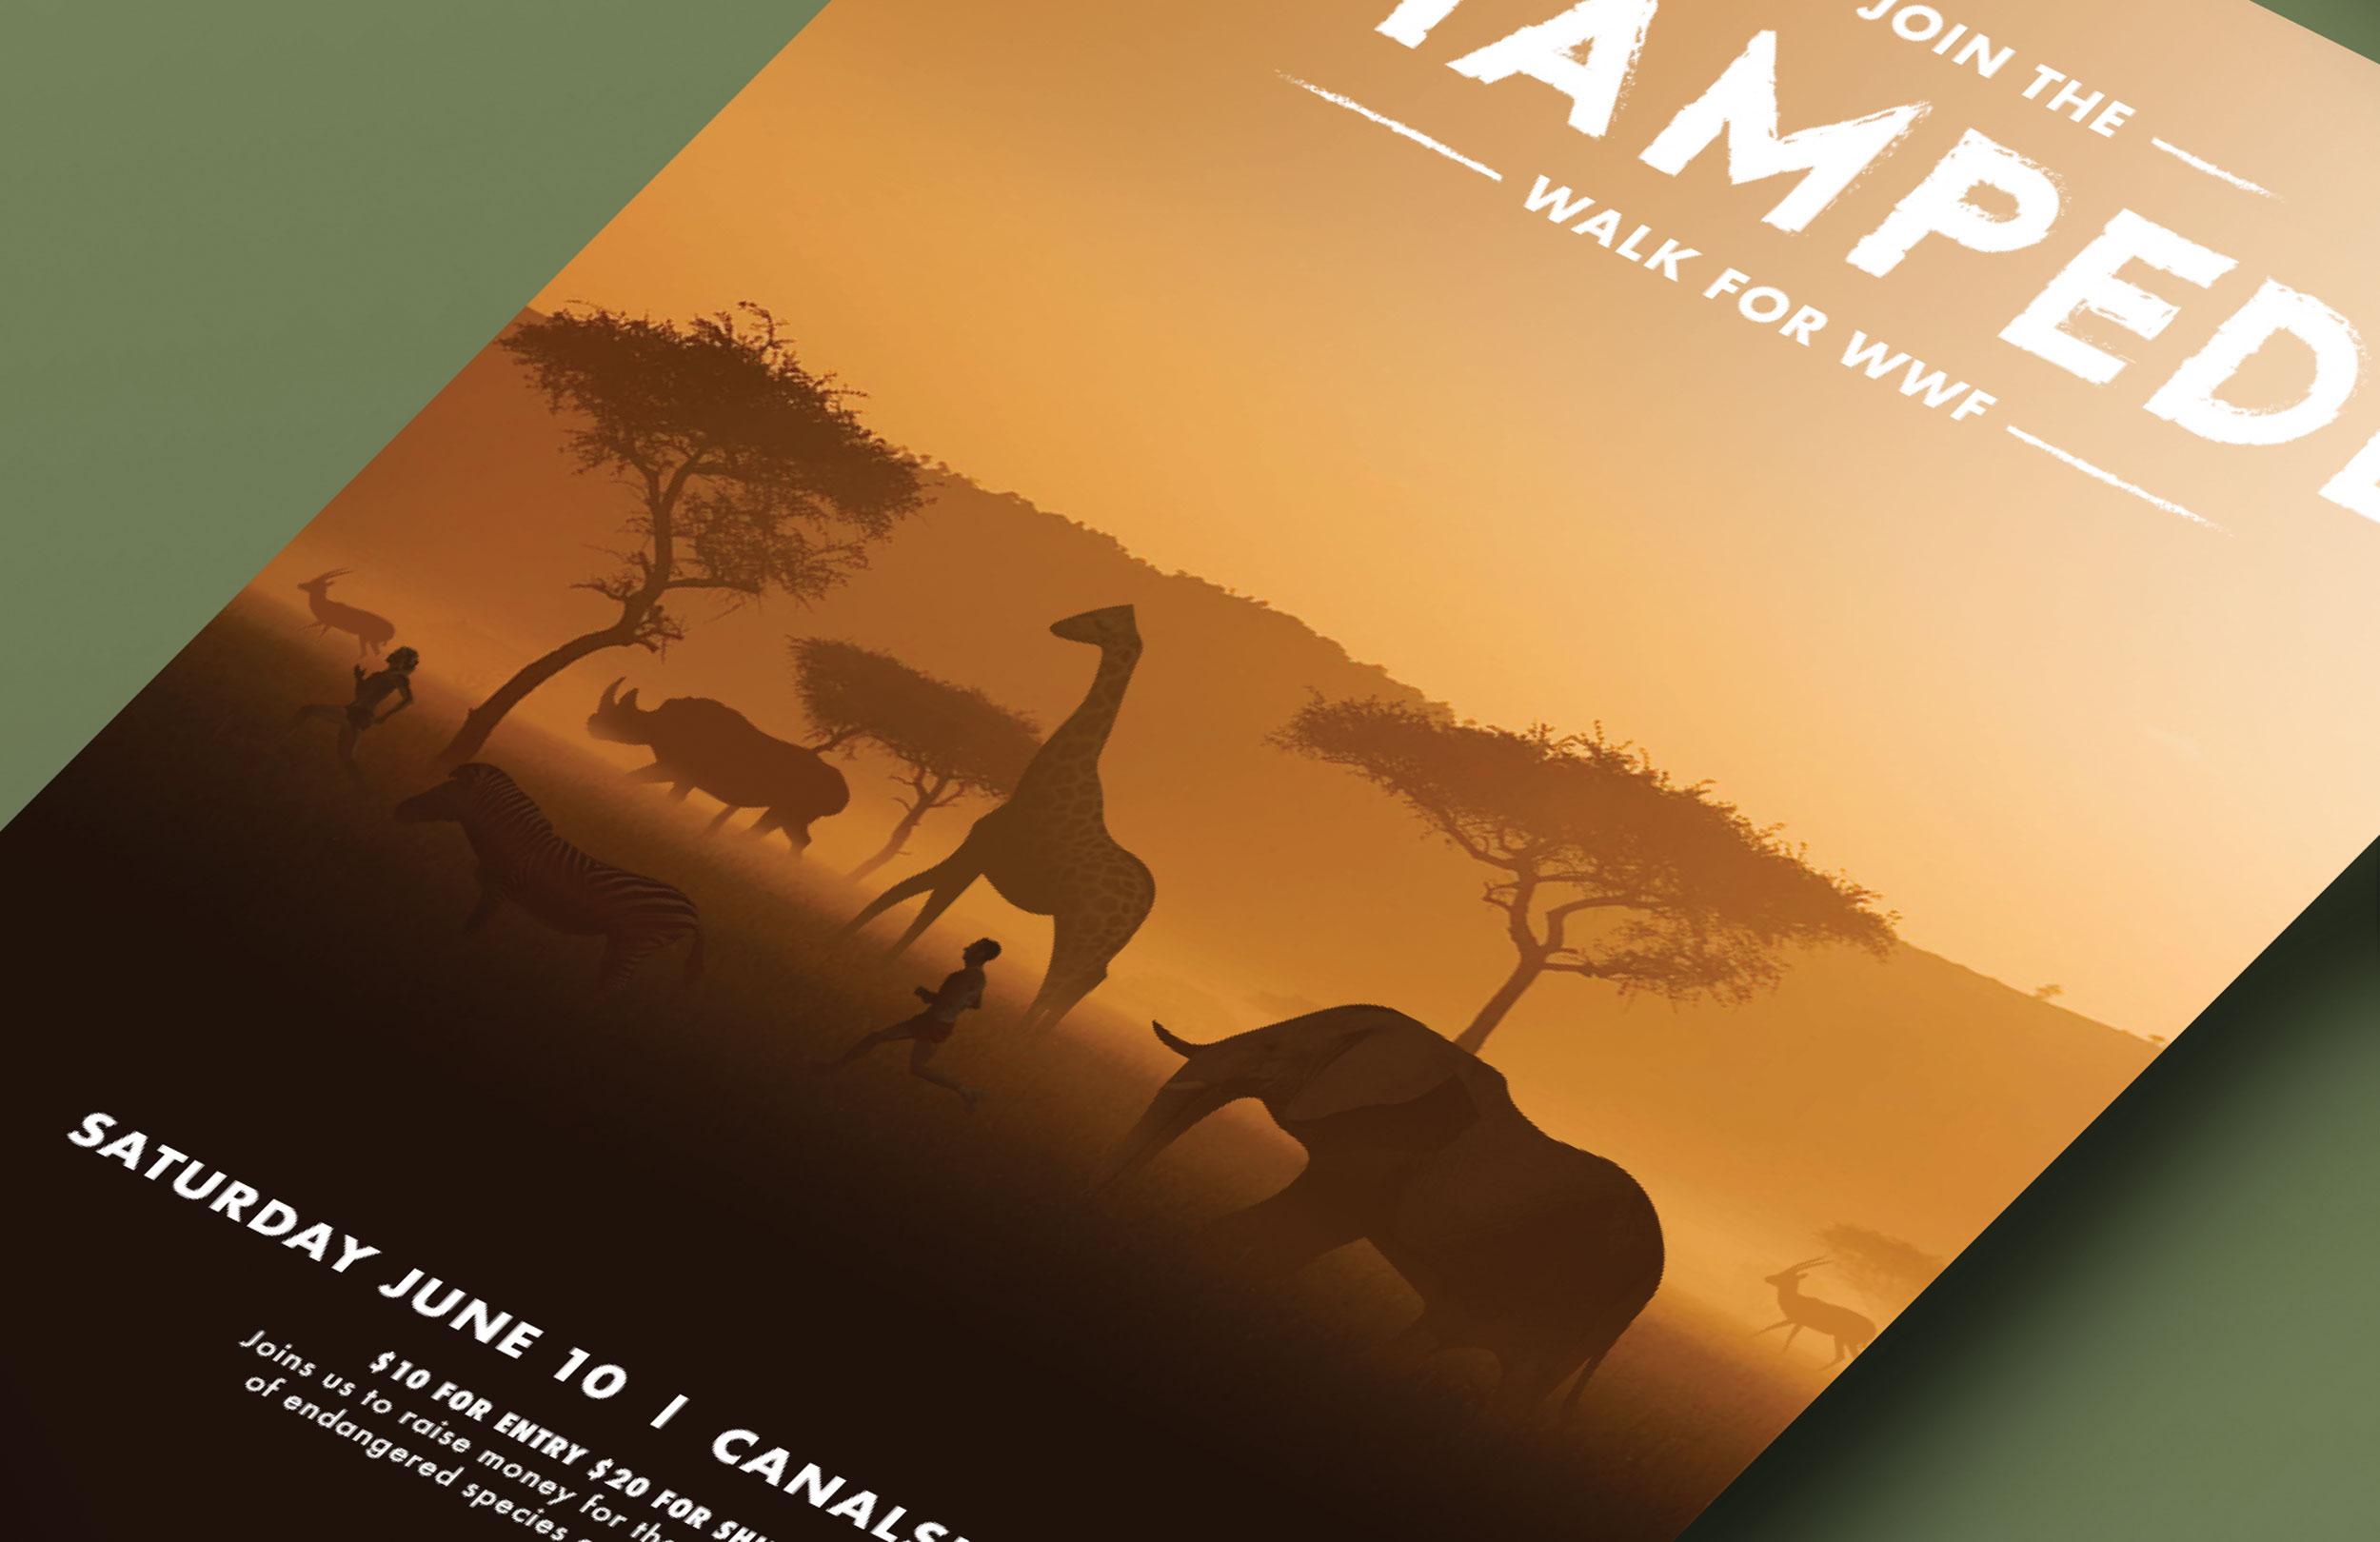 WWF_Poster_close